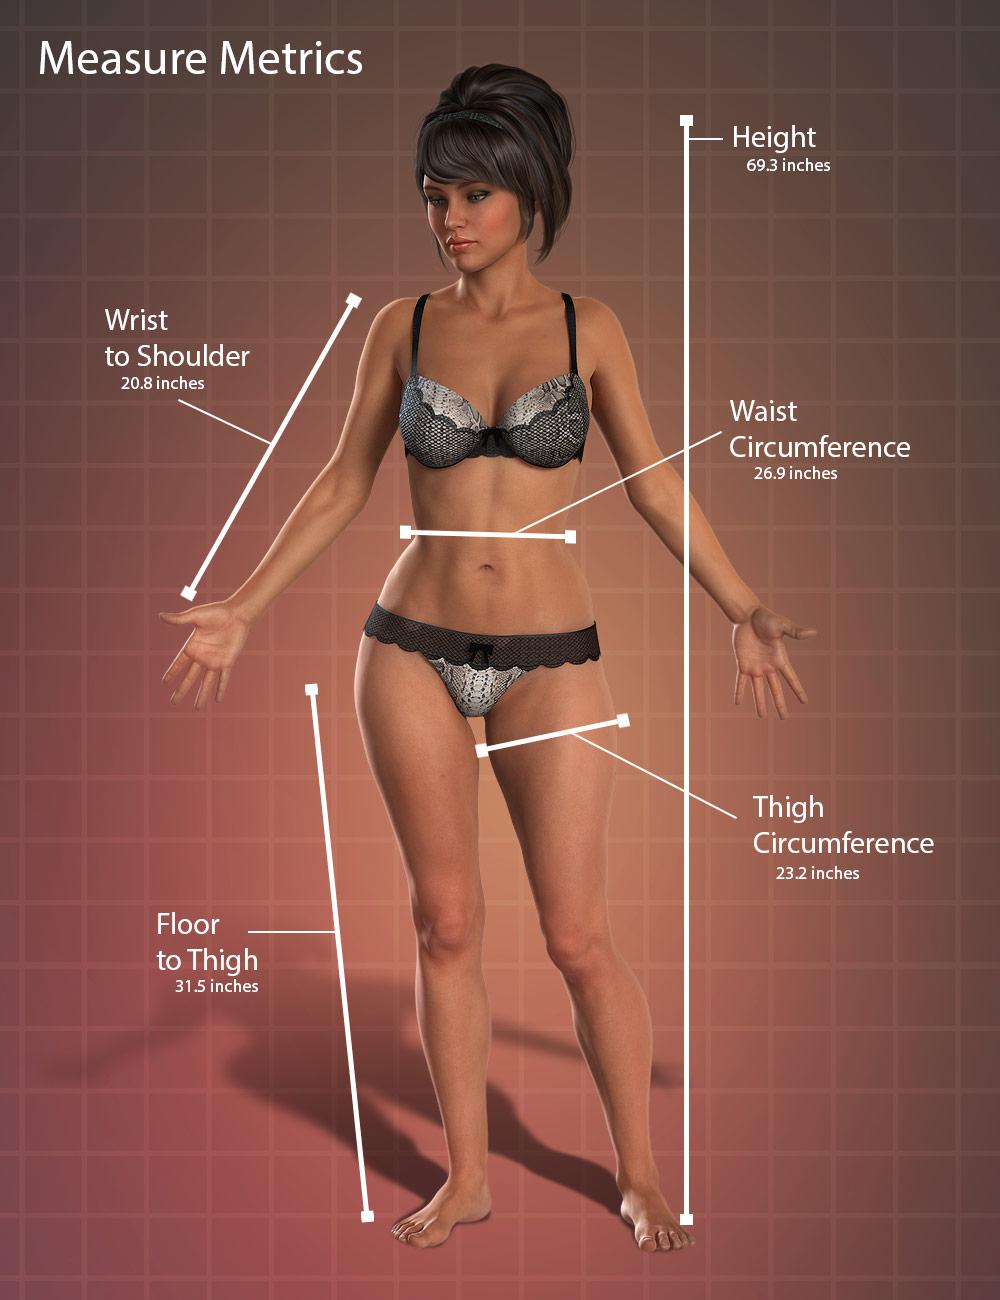 Measure Metrics for DAZ Studio by: Rob Whisenant, 3D Models by Daz 3D